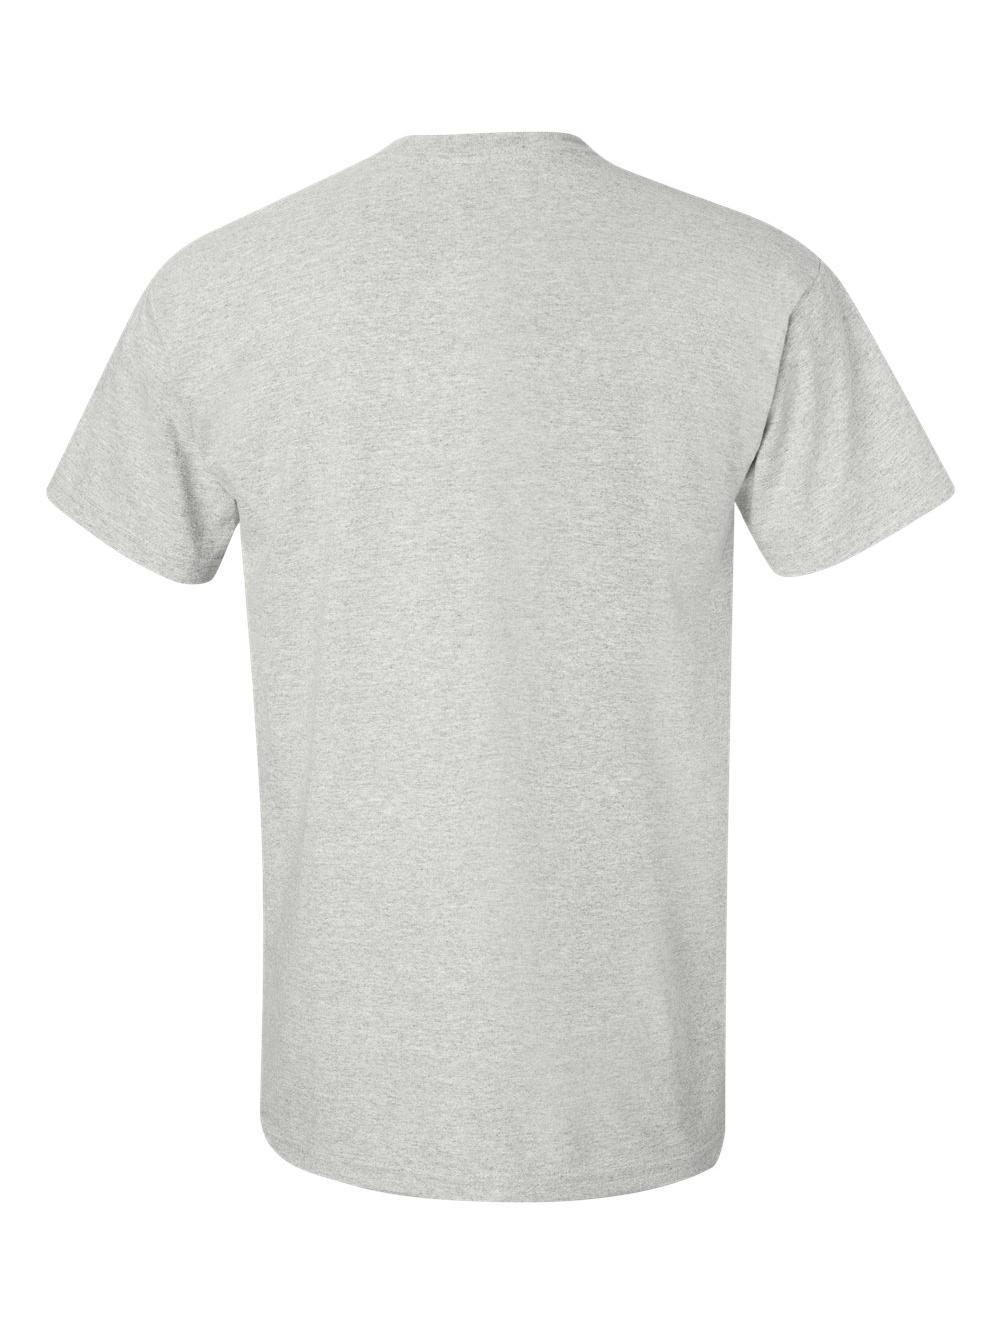 Gildan-Ultra-Cotton-T-Shirt-with-a-Pocket-2300 thumbnail 4